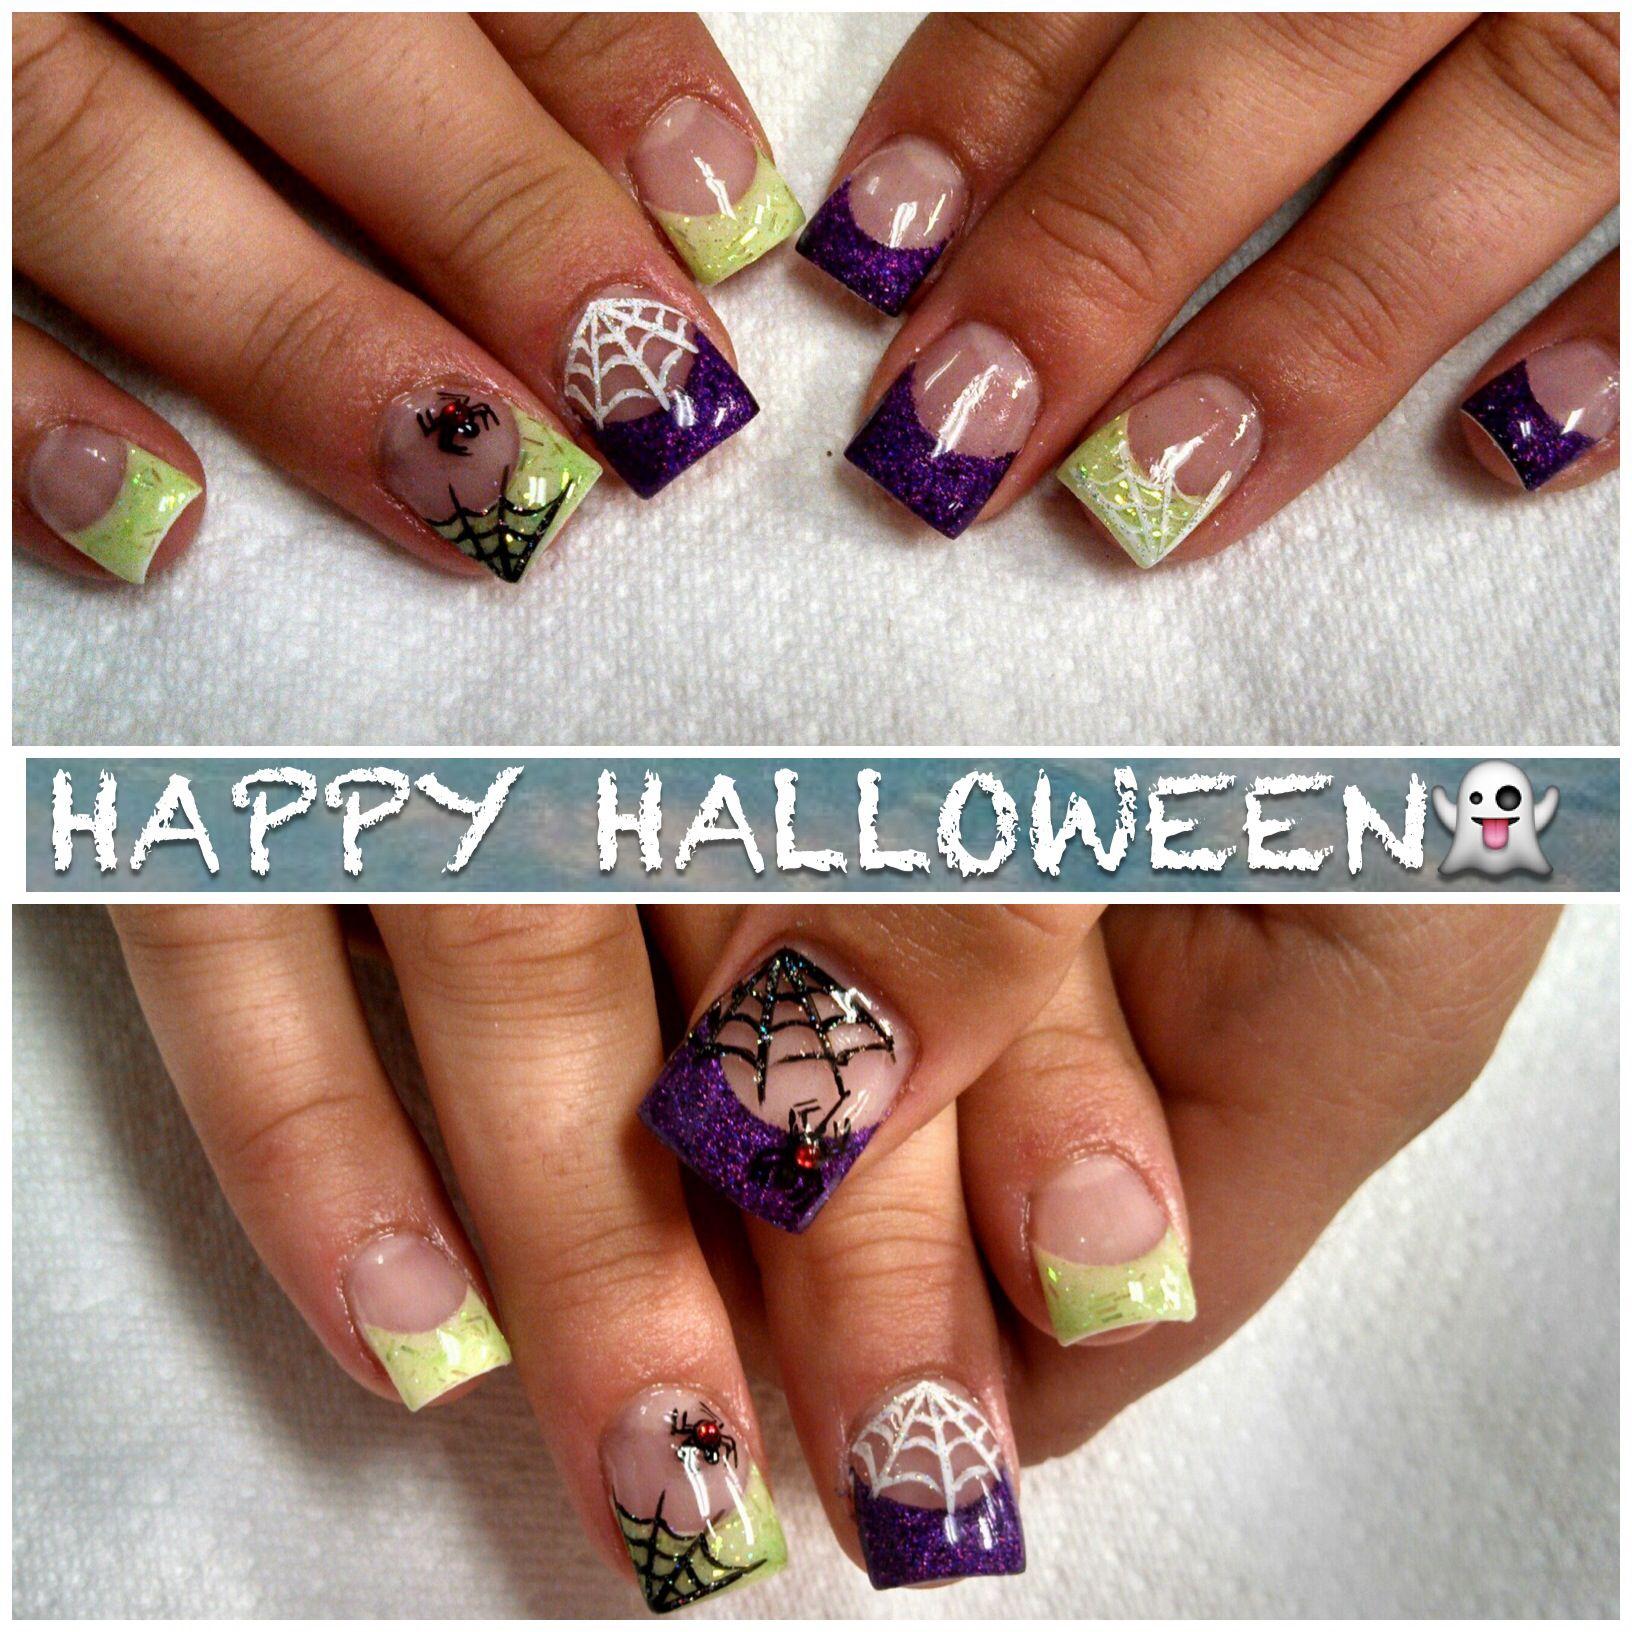 Halloween nails | Bunny nails, Festival nails, Fancy nails